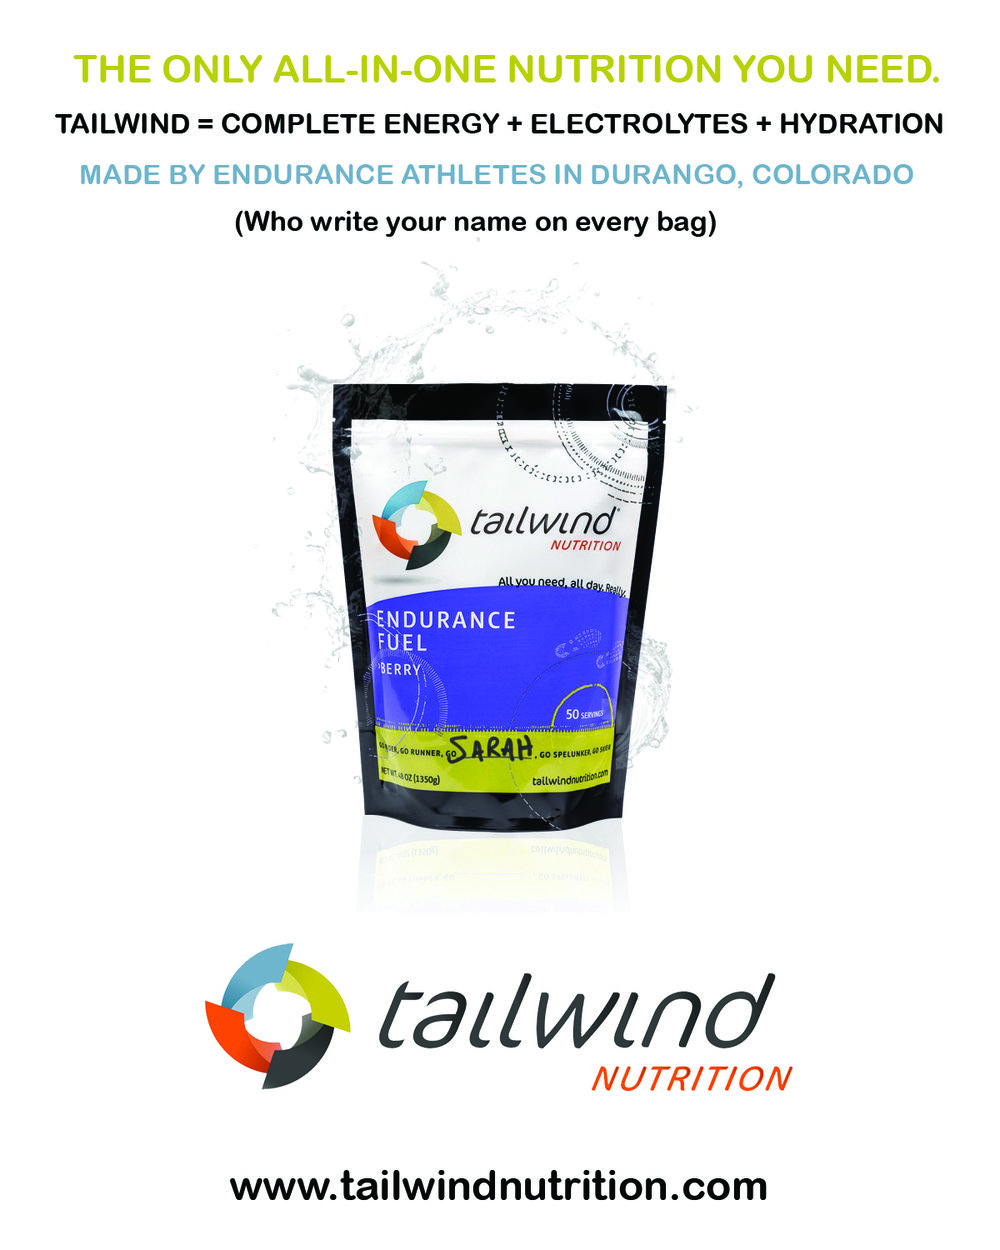 Tailwind_TheGulch.jpg